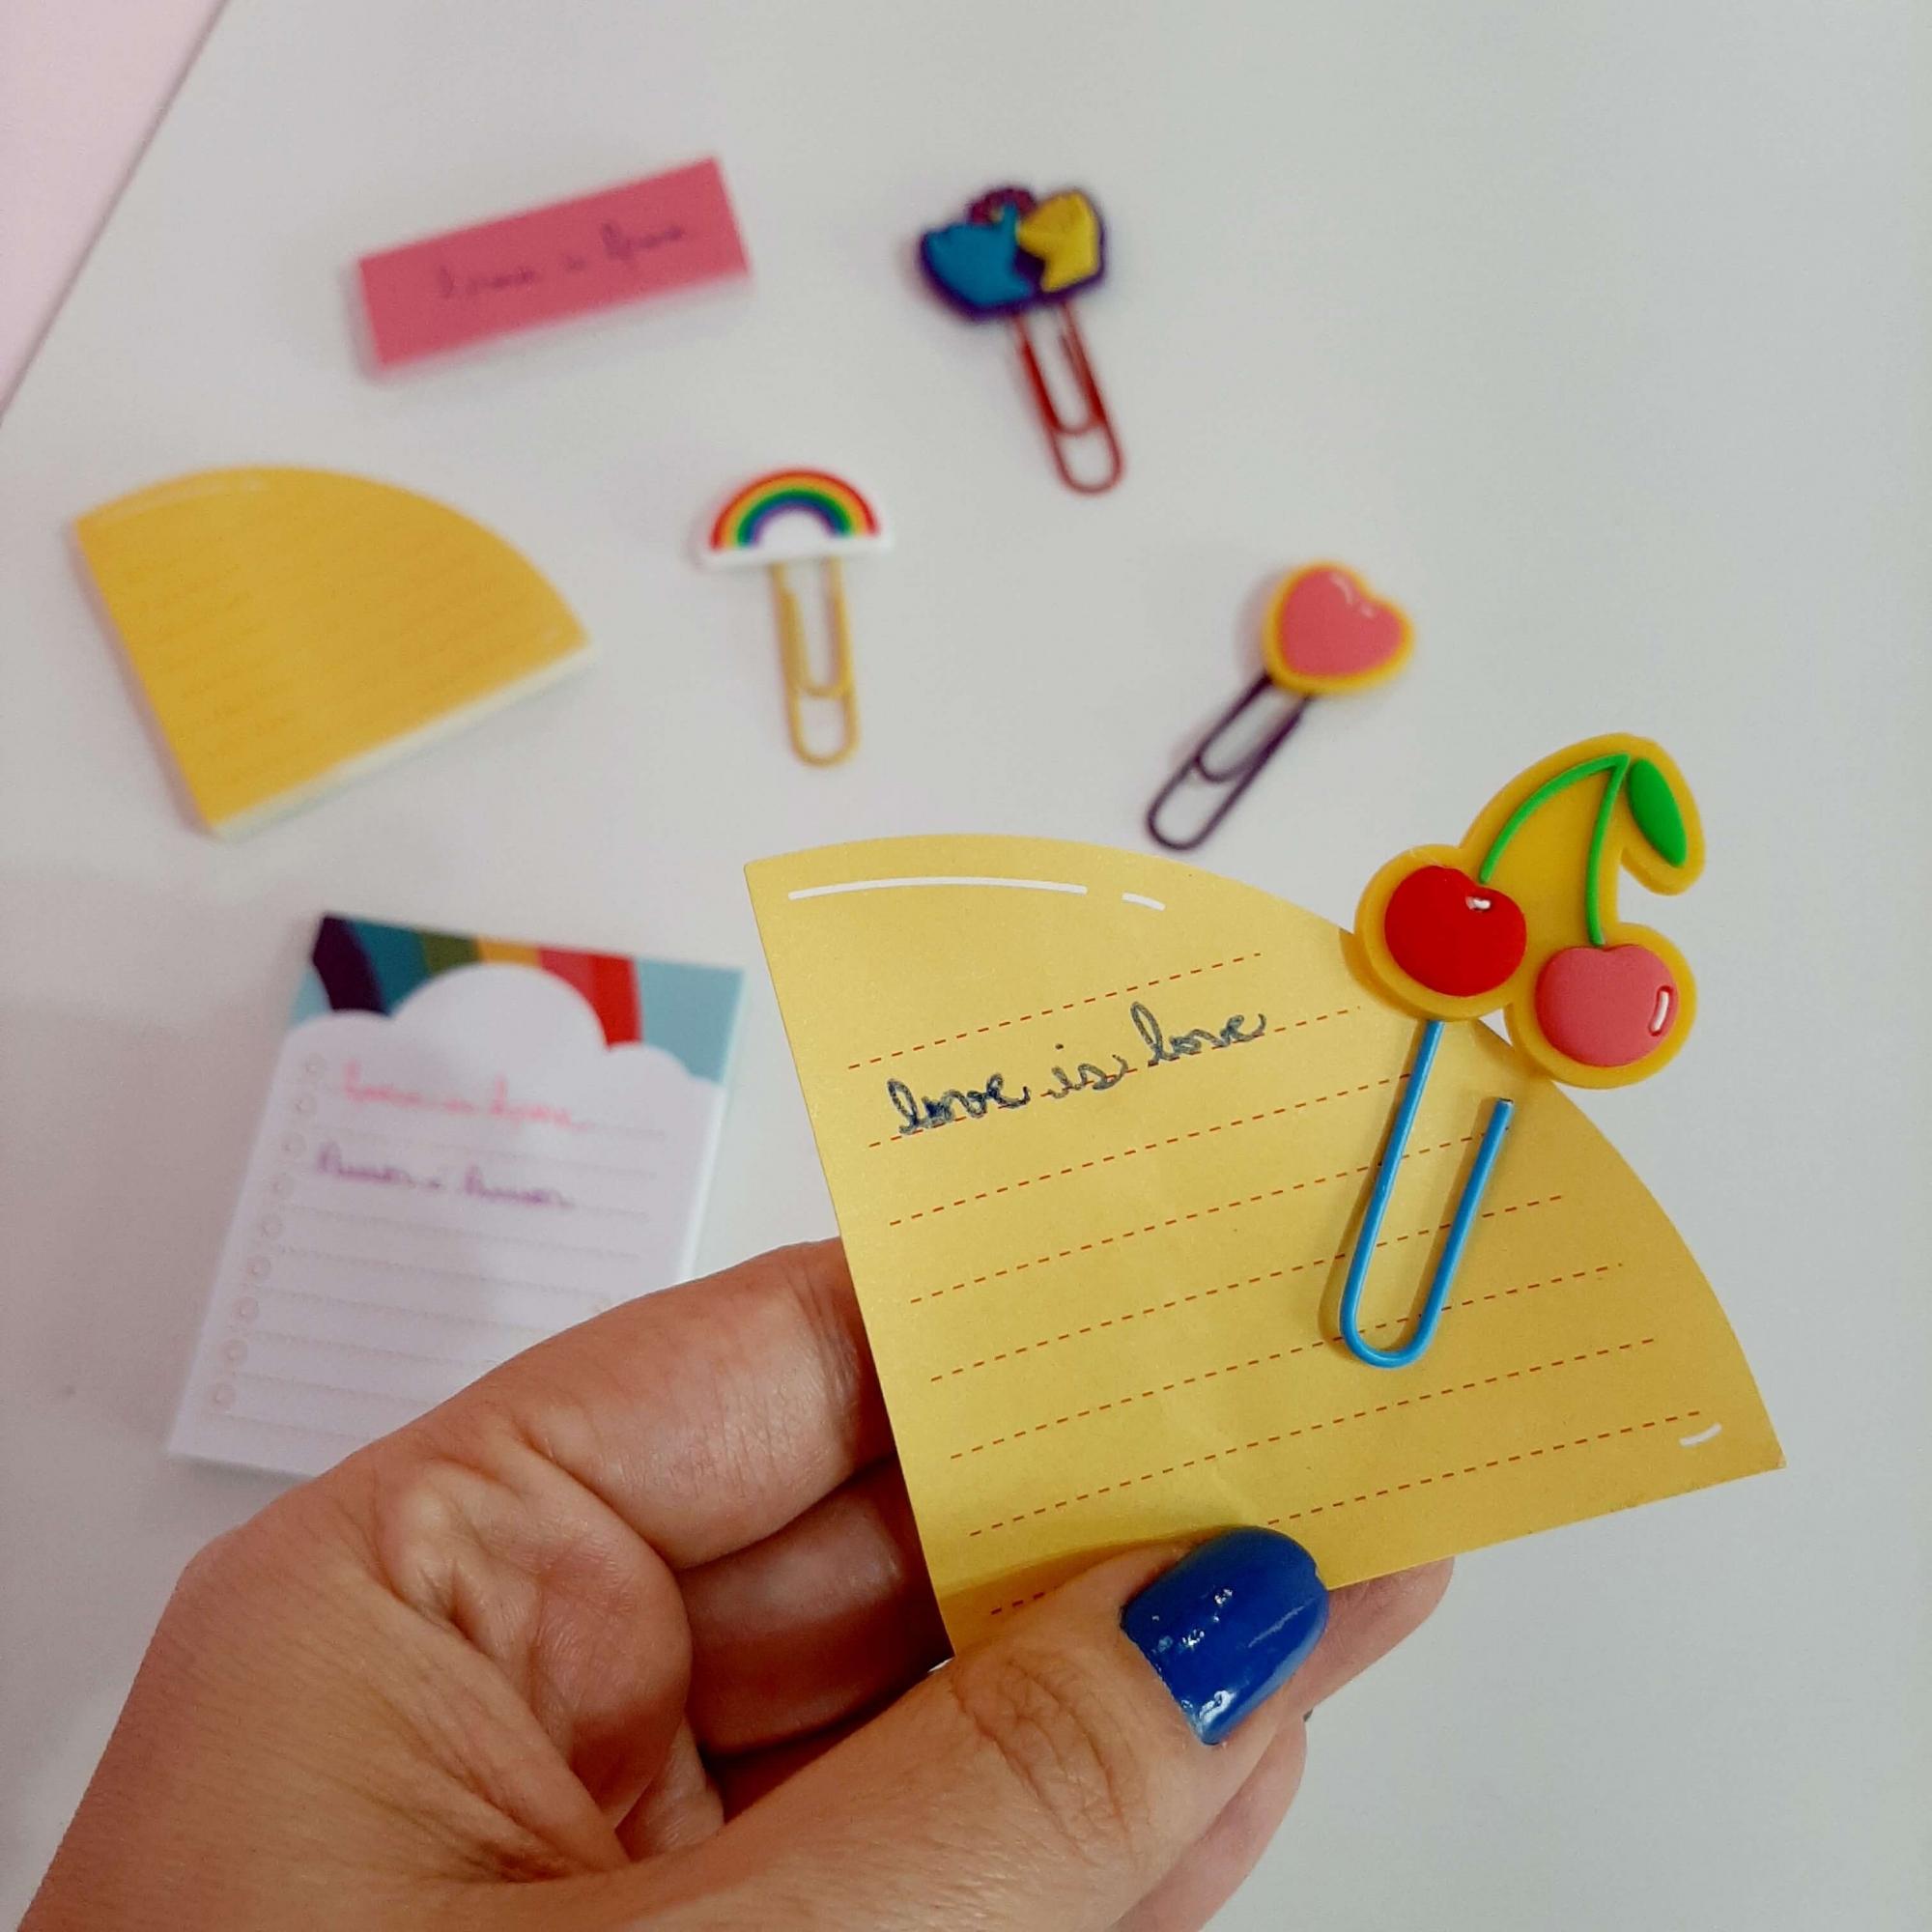 Clips Love is Love Jocar Office 4 Un